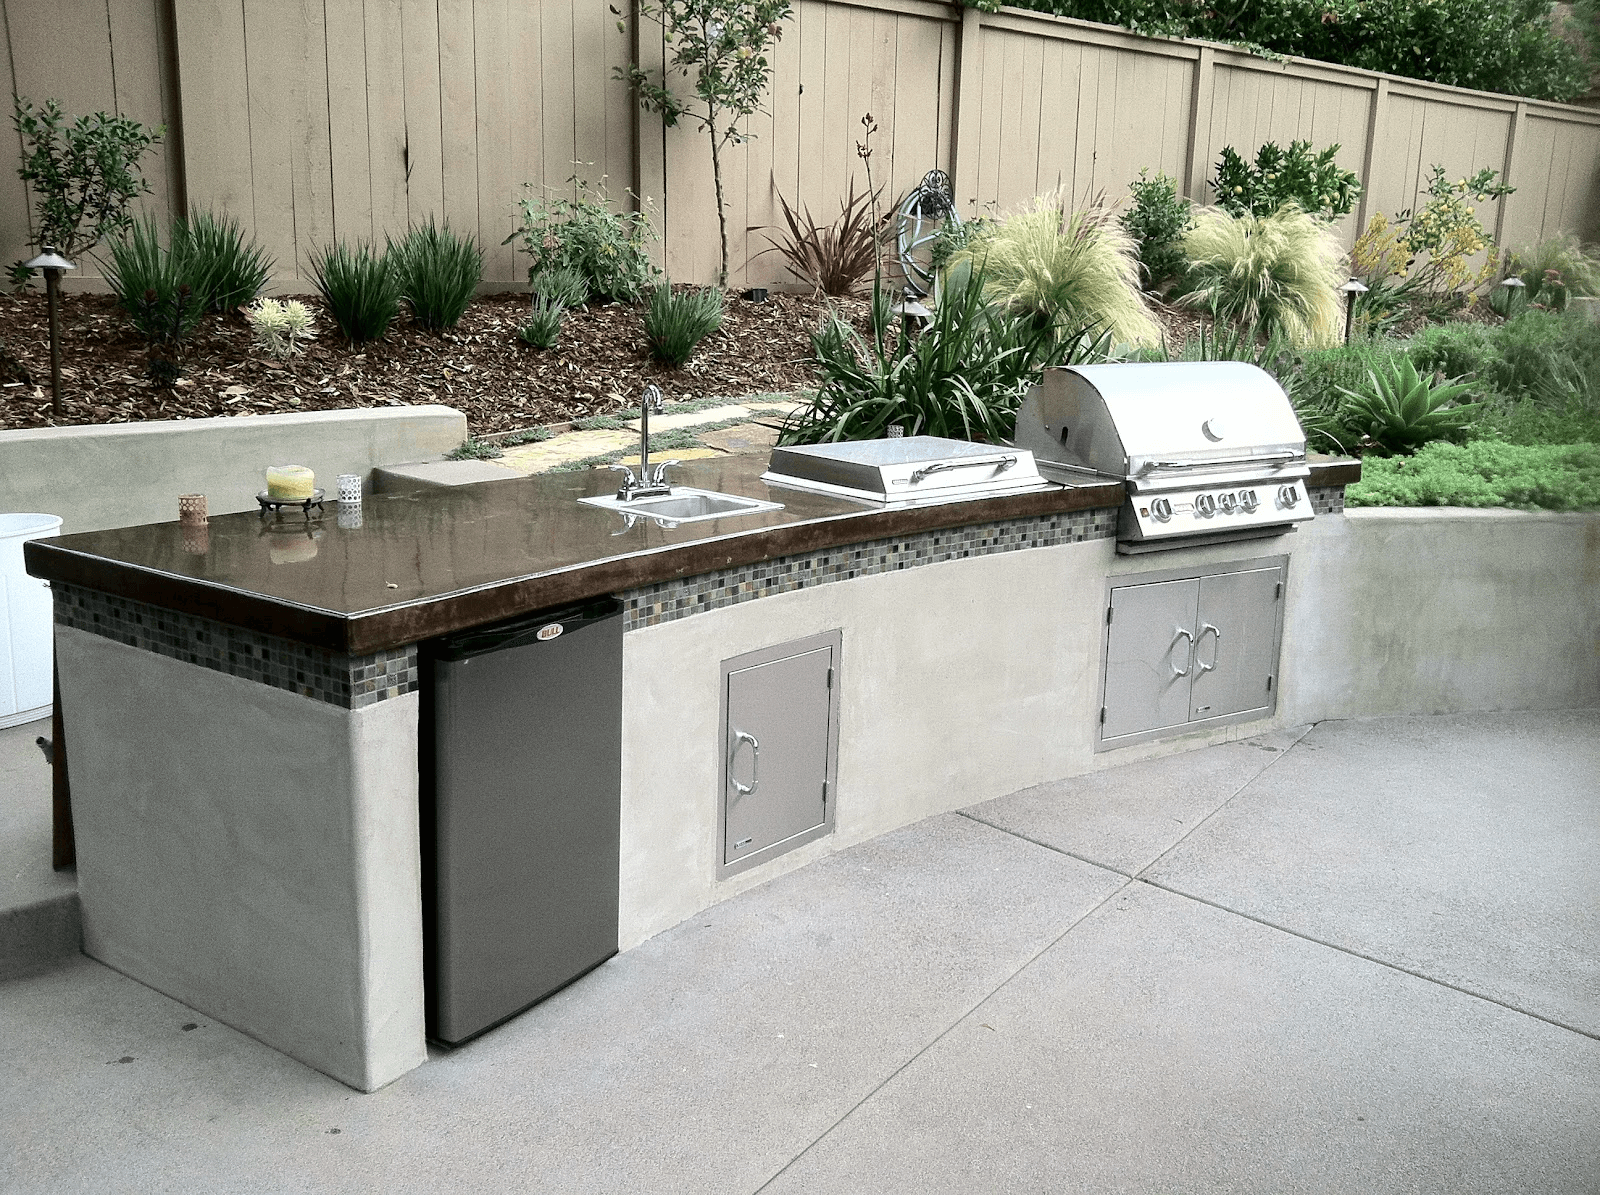 Outdoor Kitchen Island With Sink Outdoor Barbeque Kitchen Island With Sink Outdoor Kitchen Countertops